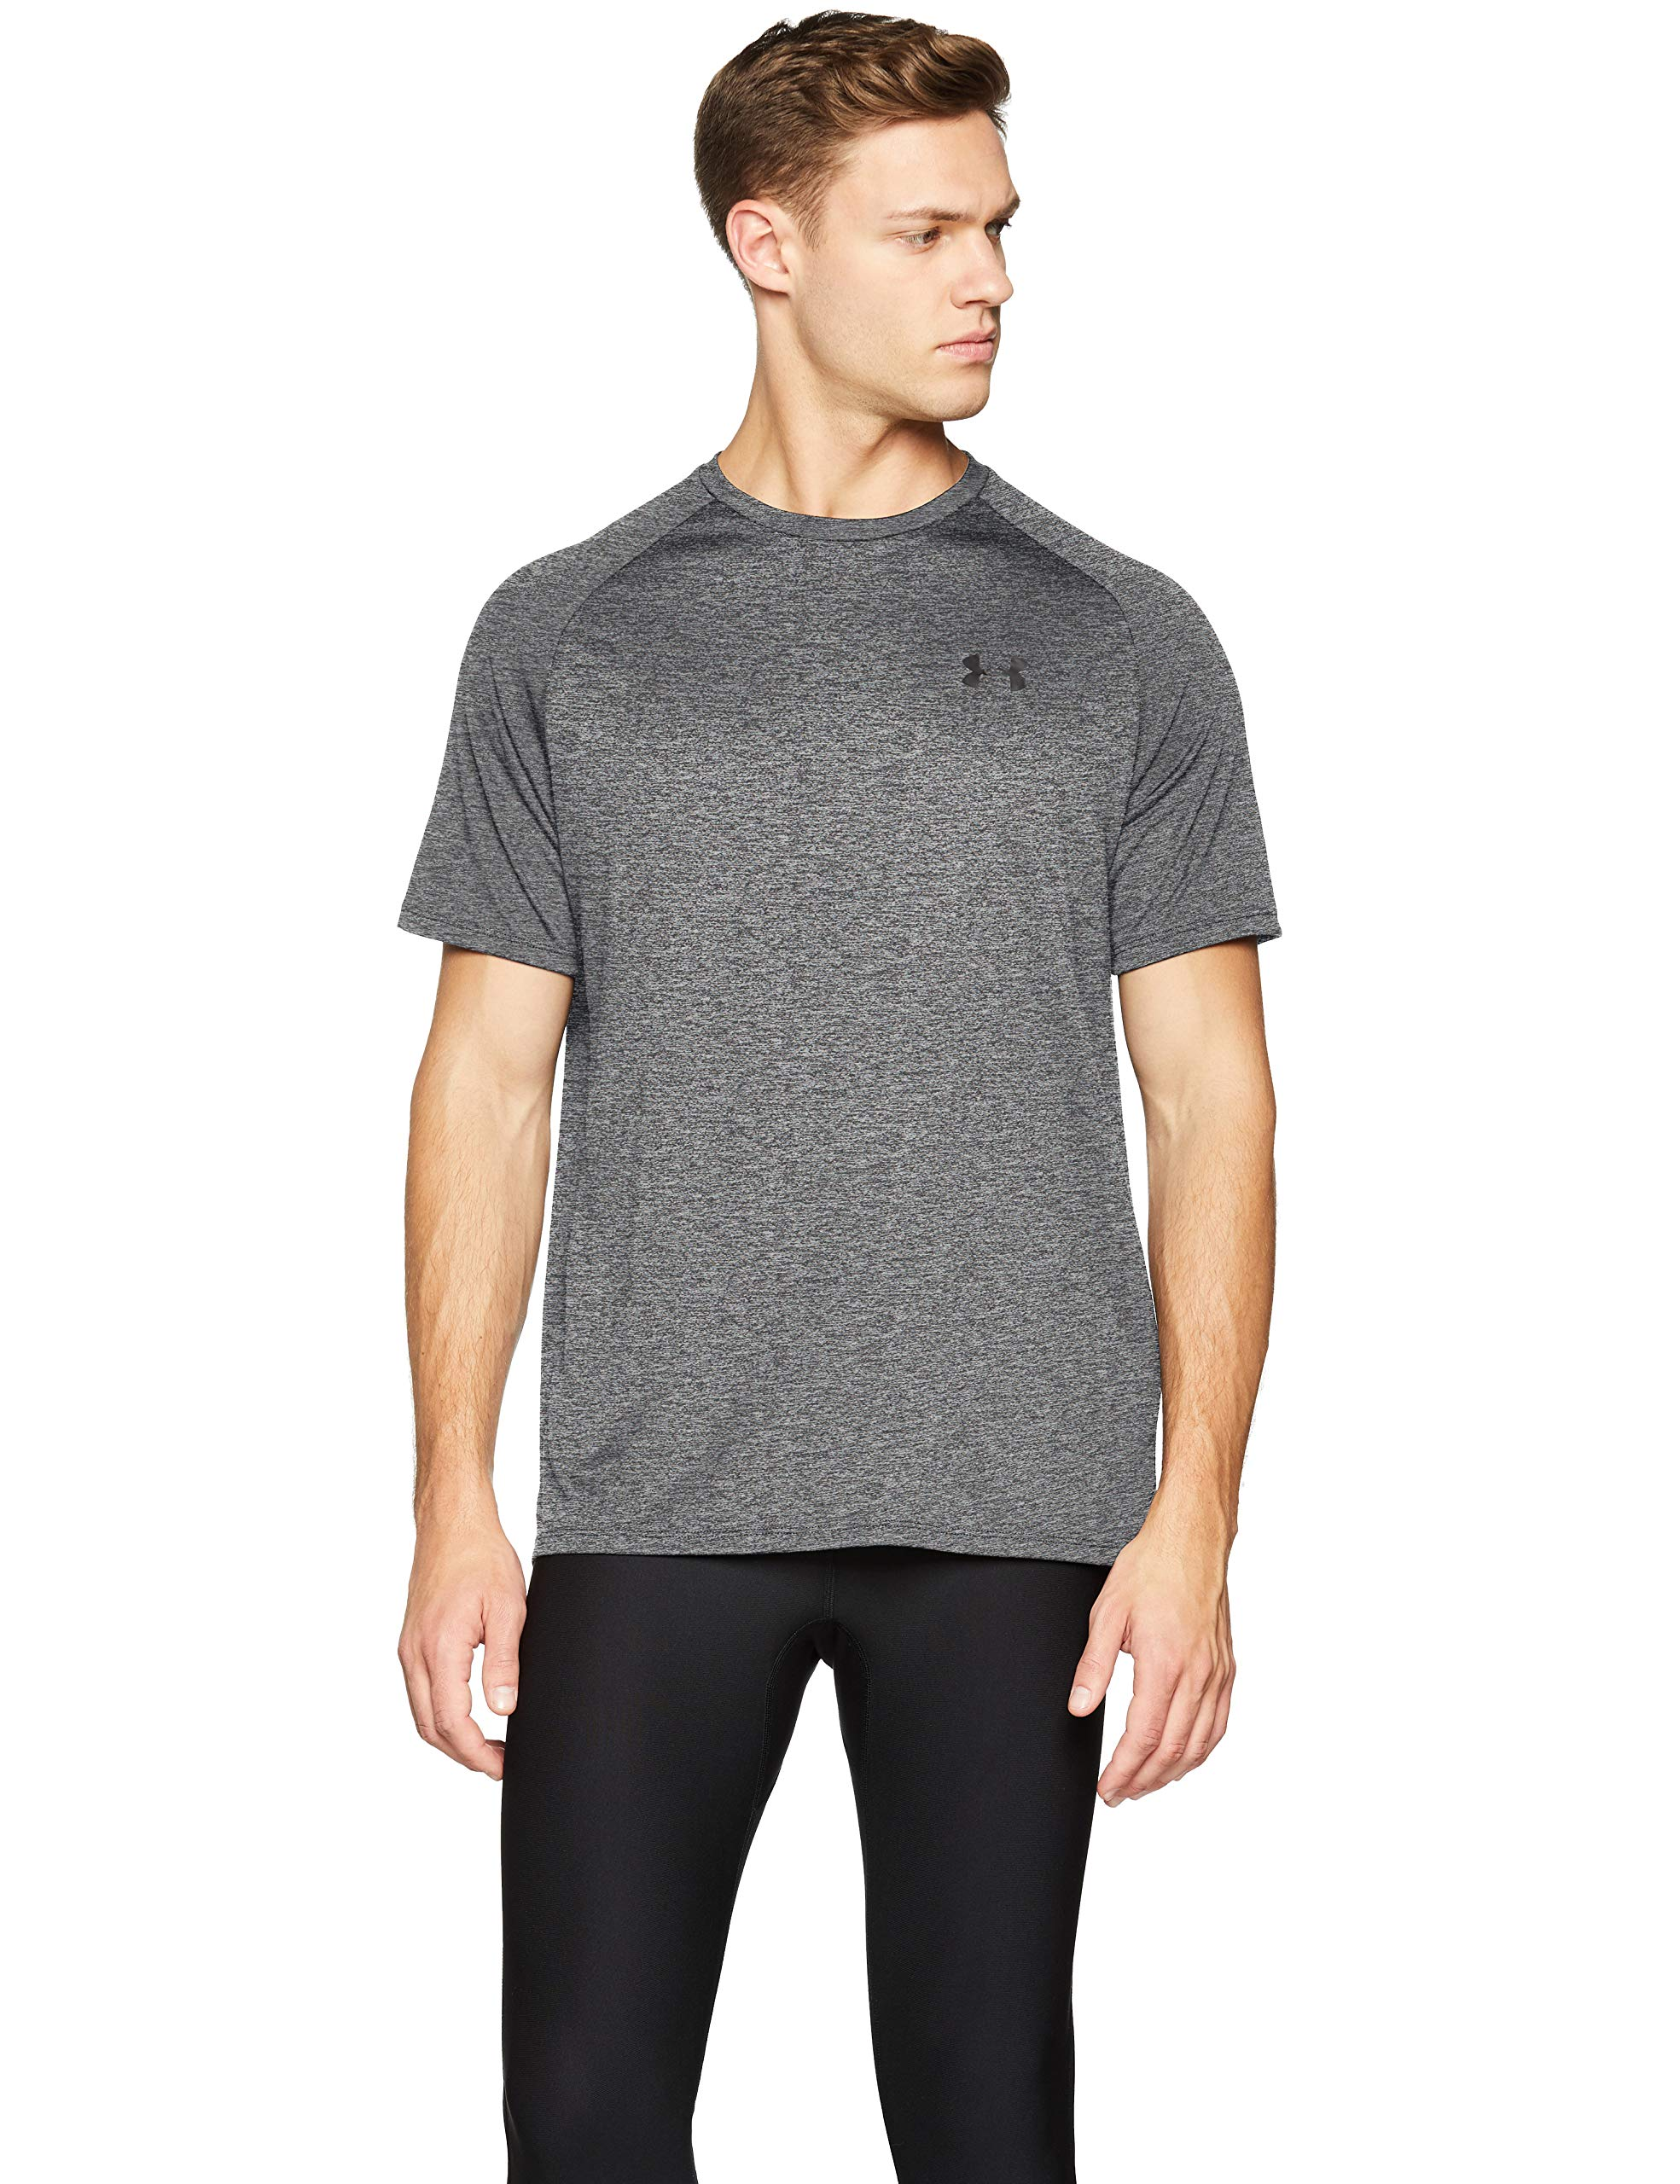 Under Armour Men's Tech 2.0 Short Sleeve T-Shirt, Black (002)/Black, 3X-Large